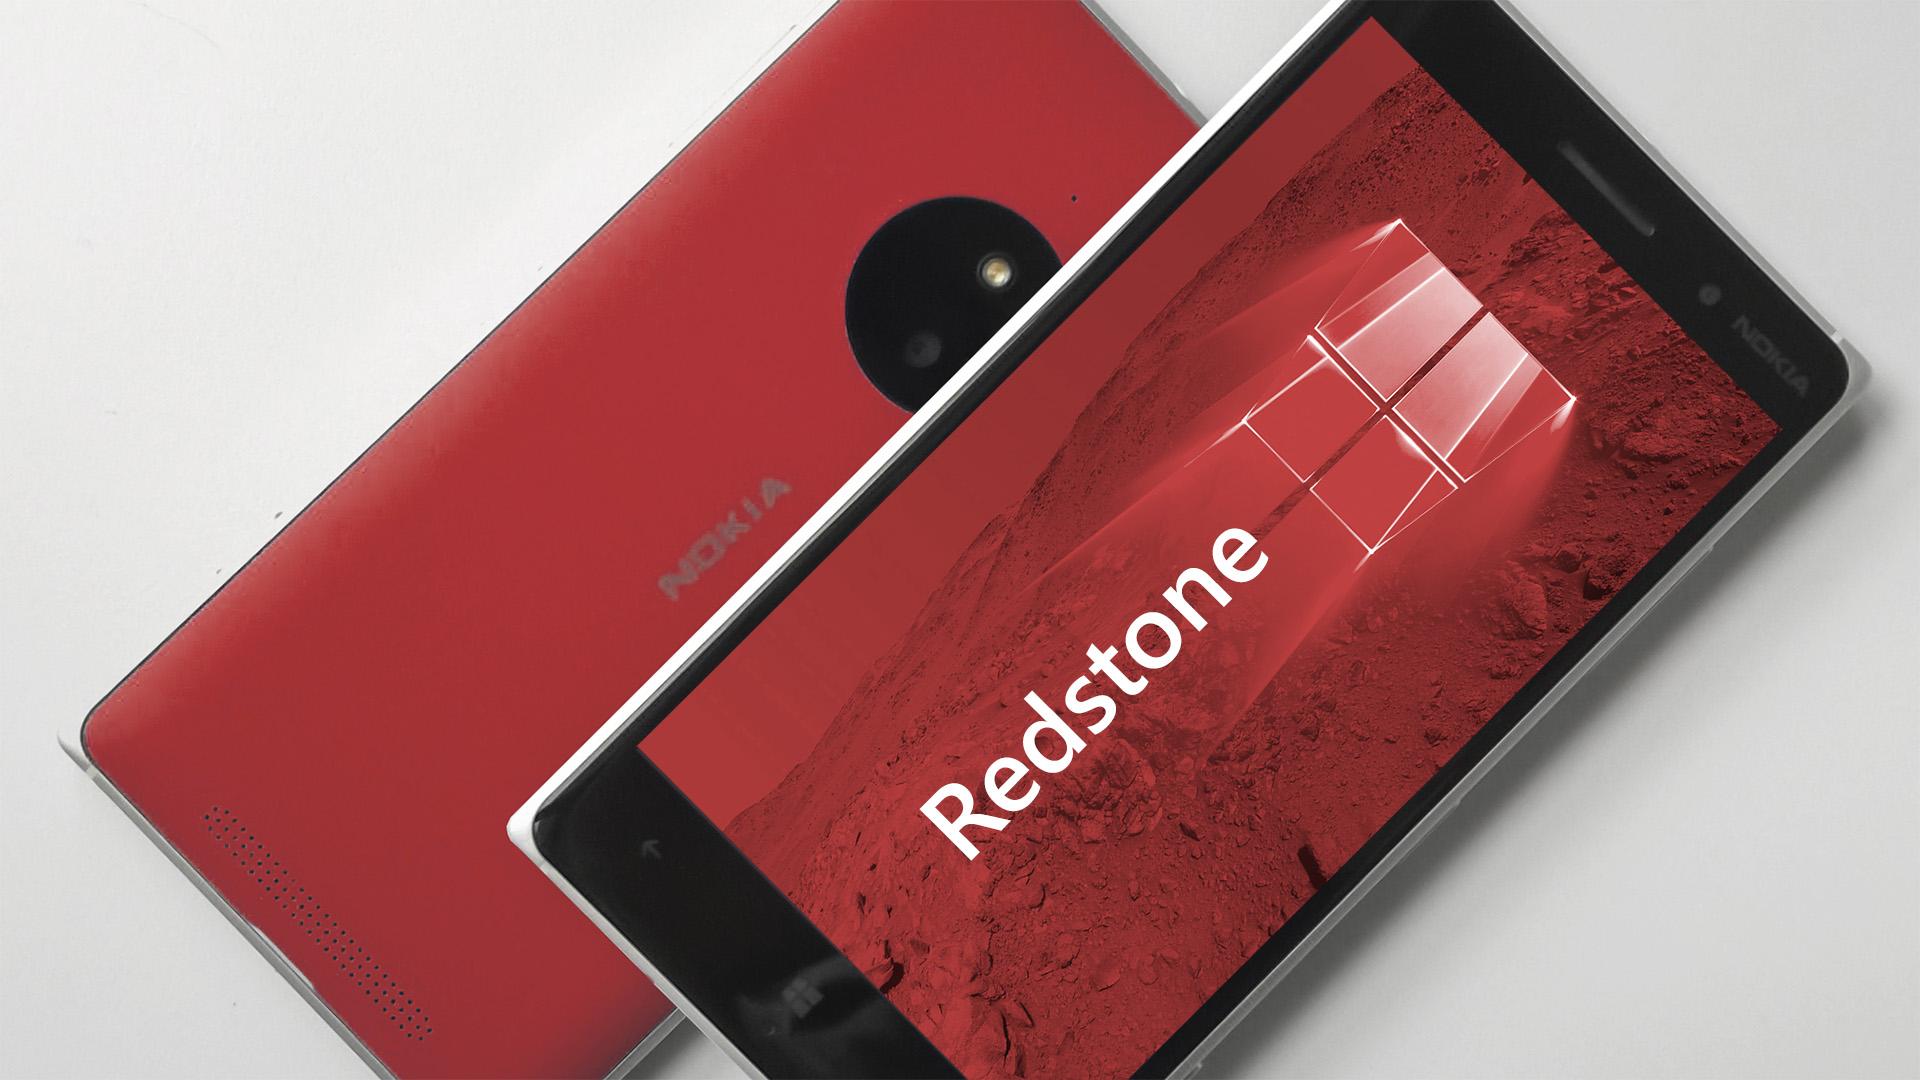 Lumia Redstone windows 10 mobile